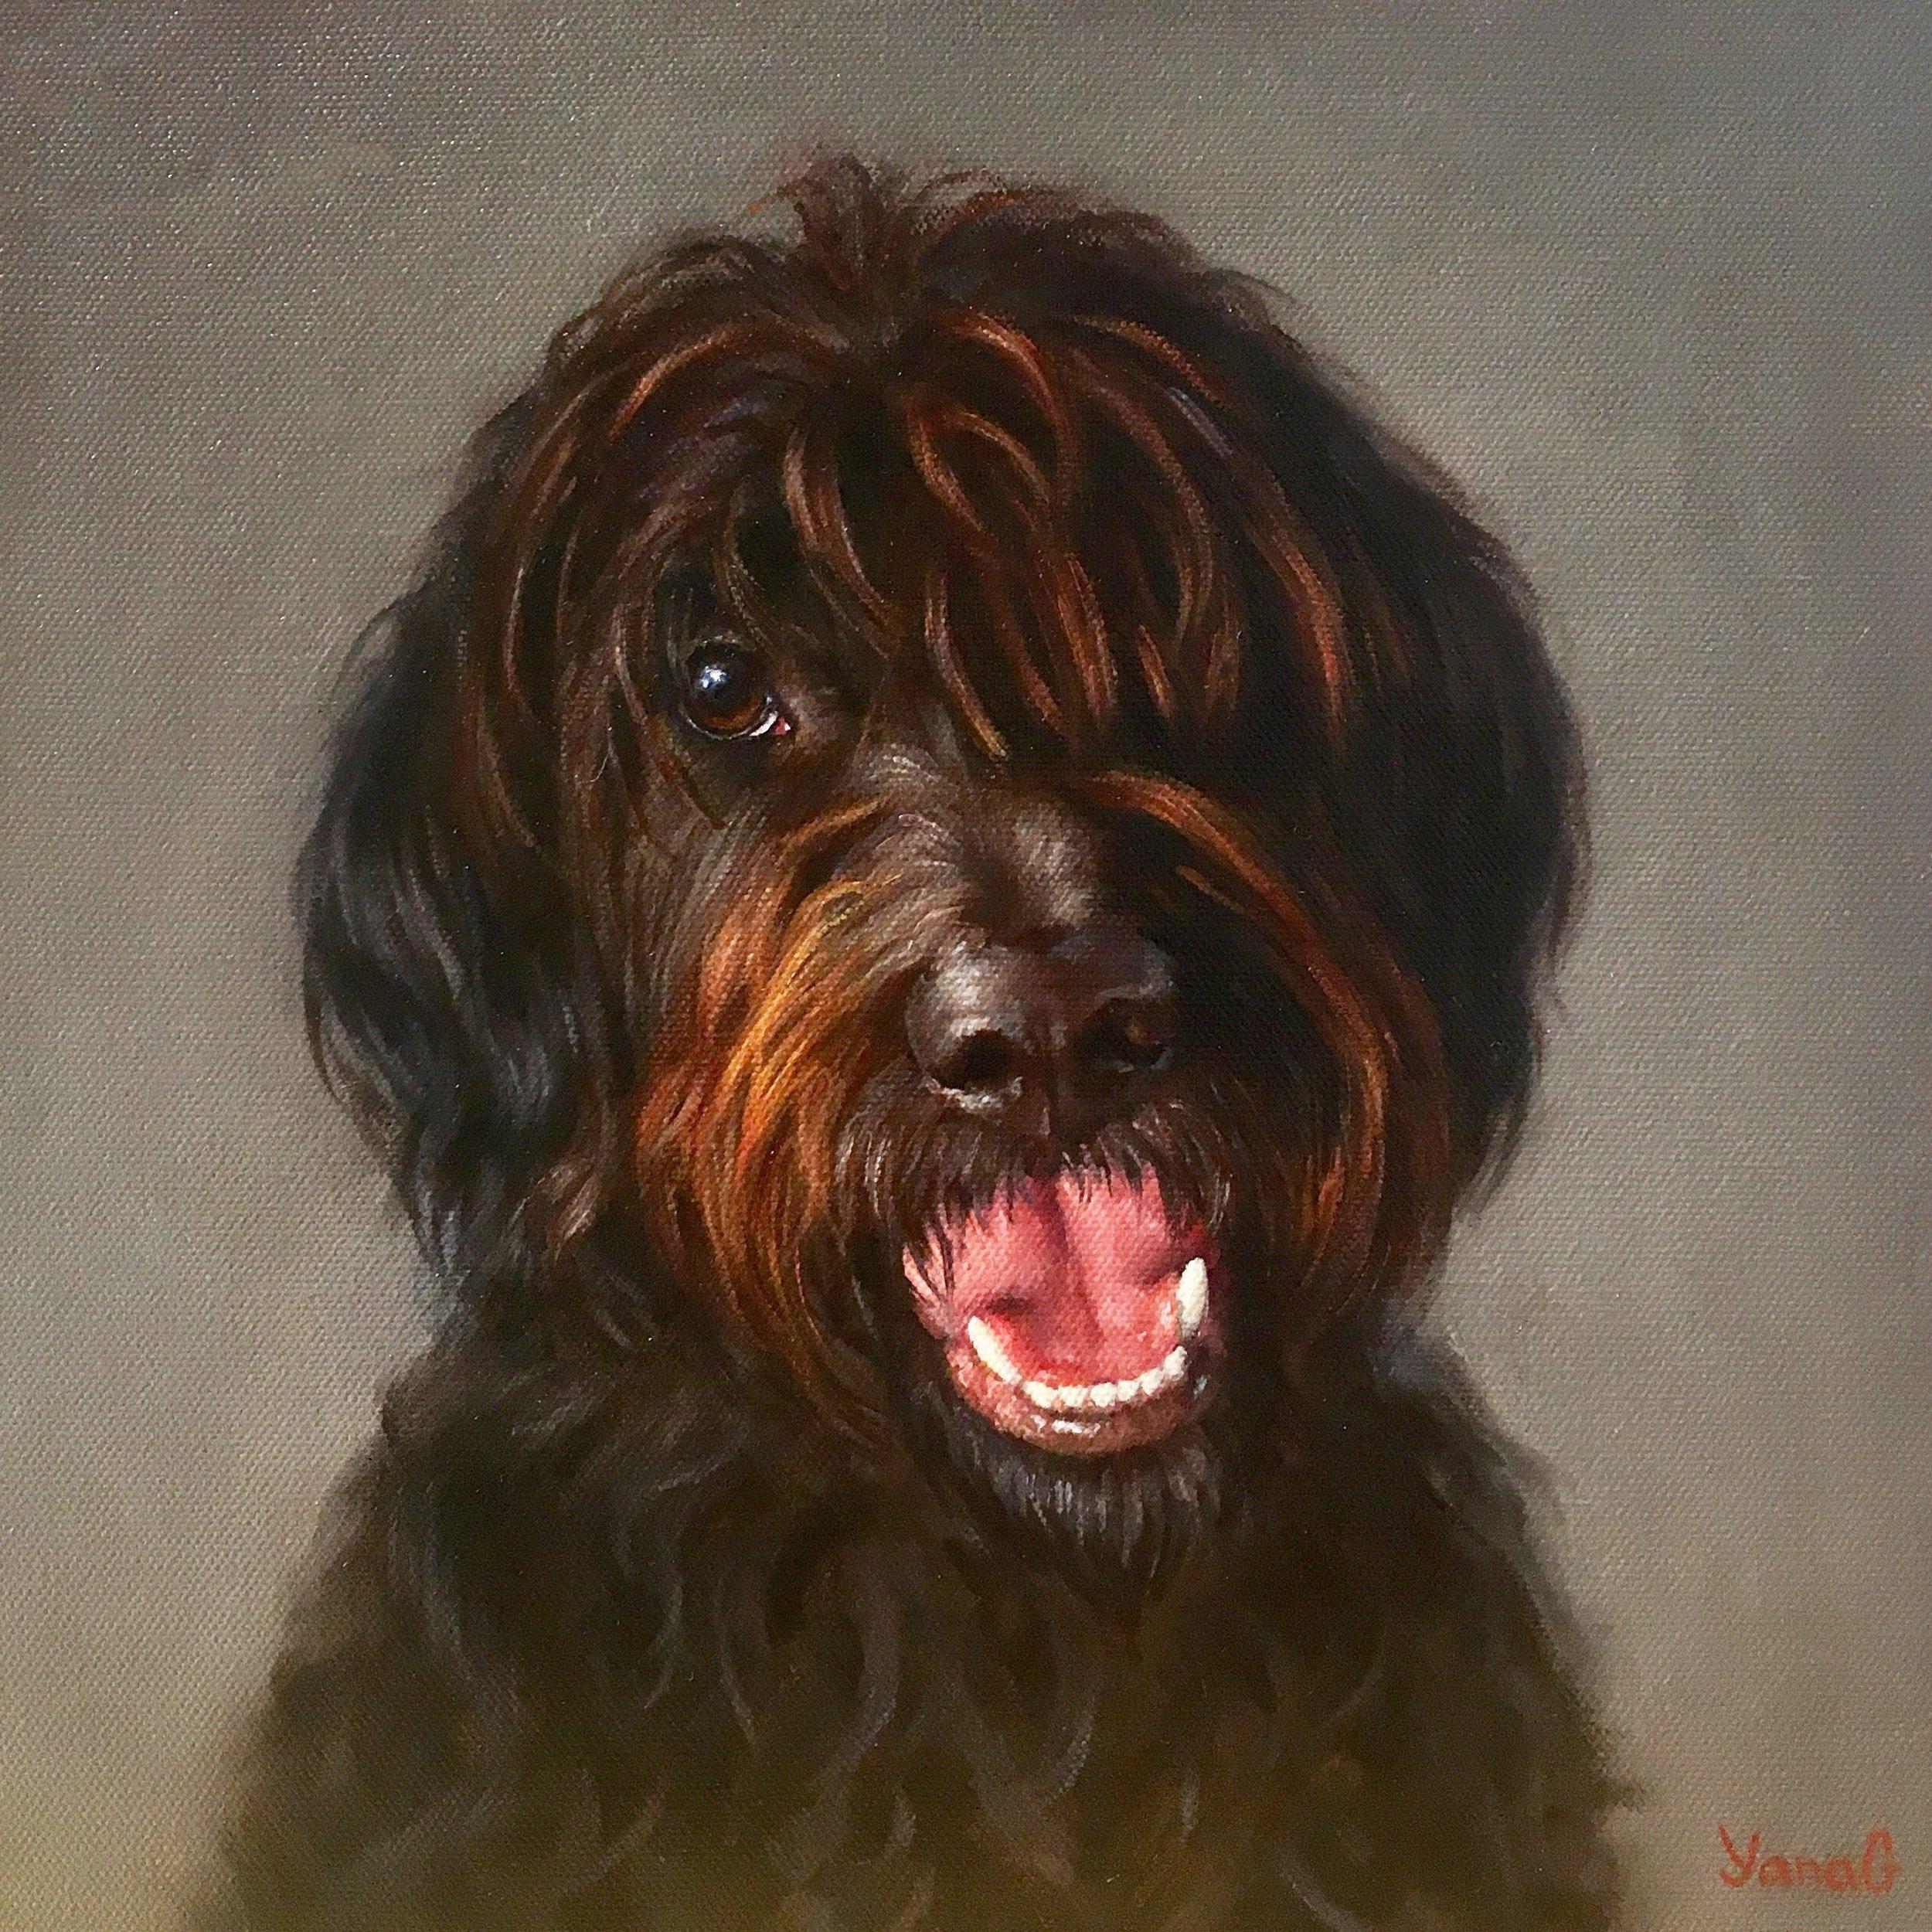 Charli 12x12 Oil on canvas